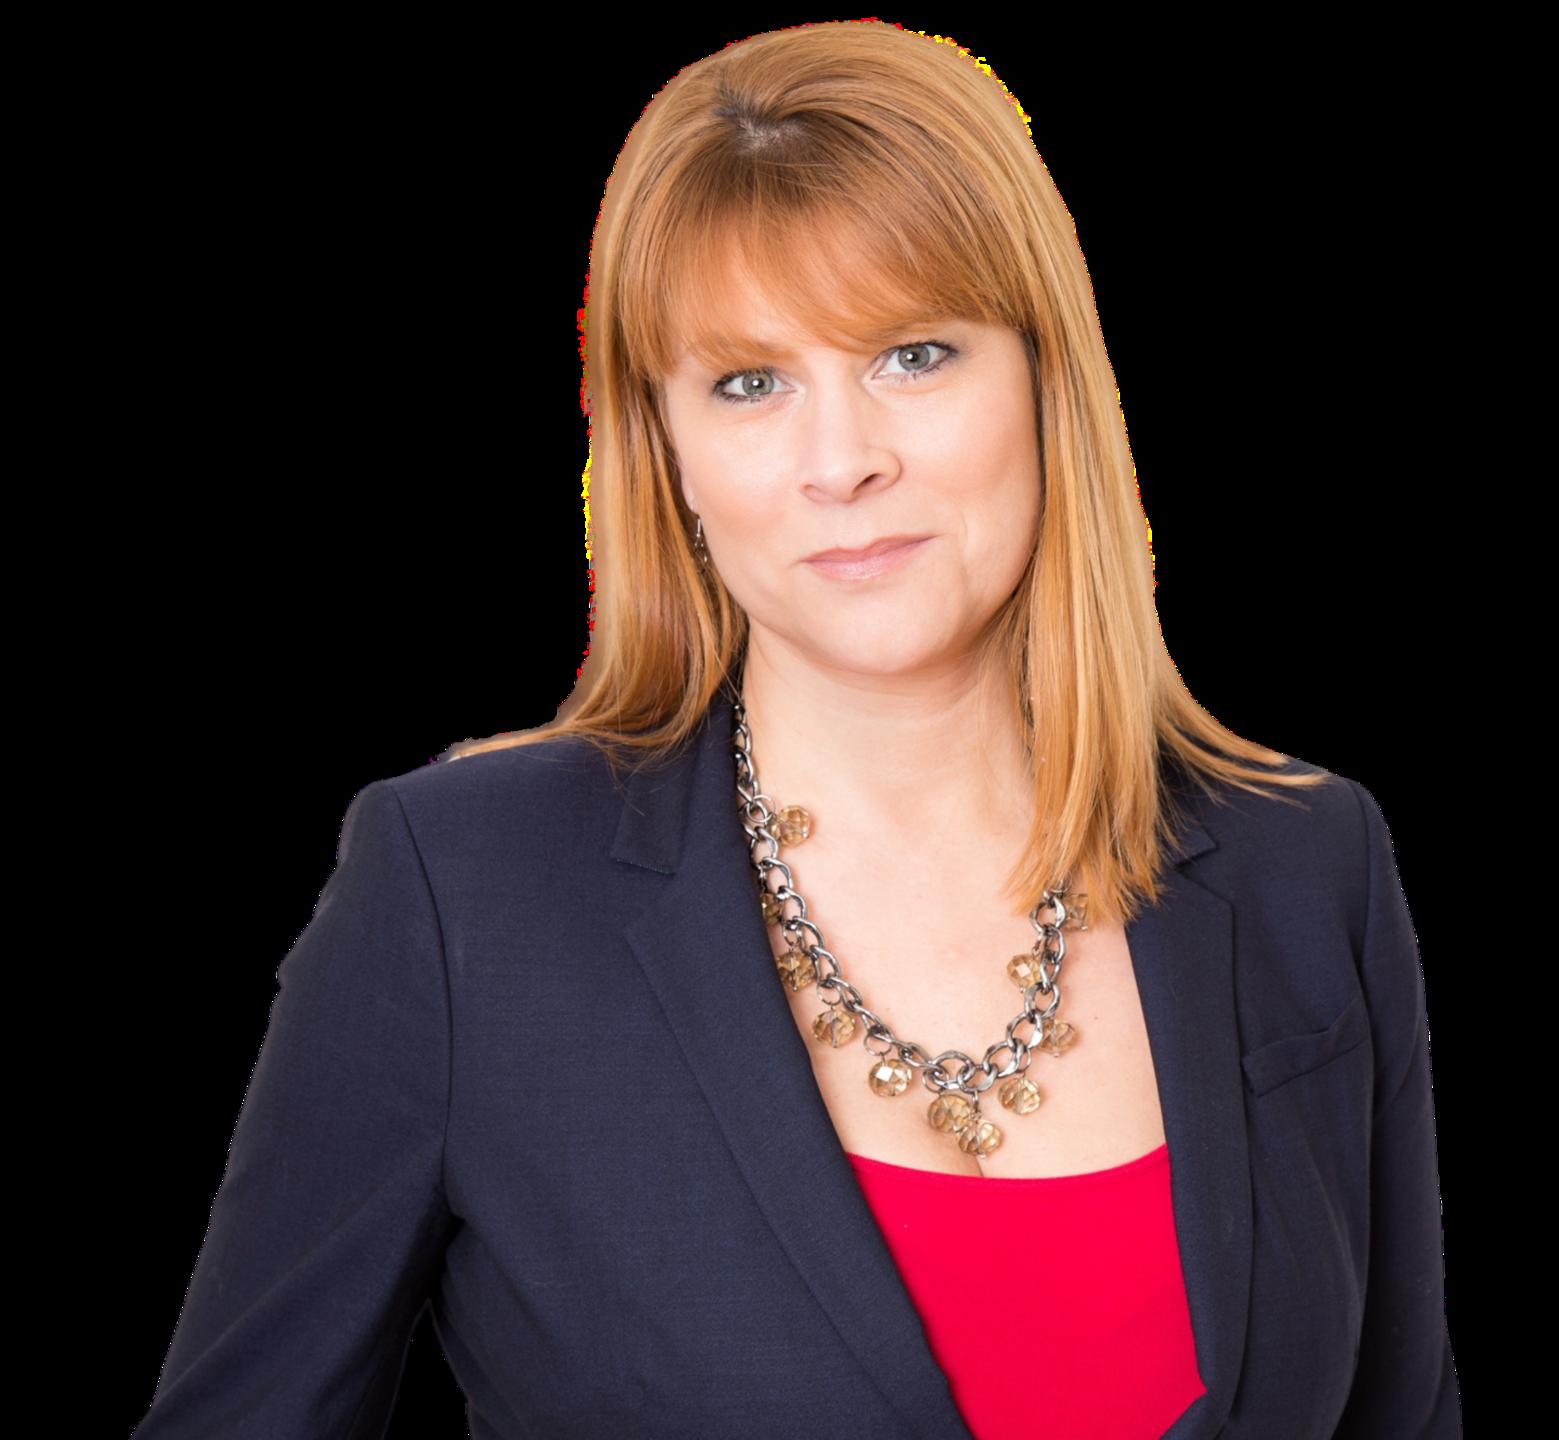 Carolyn Dickinson